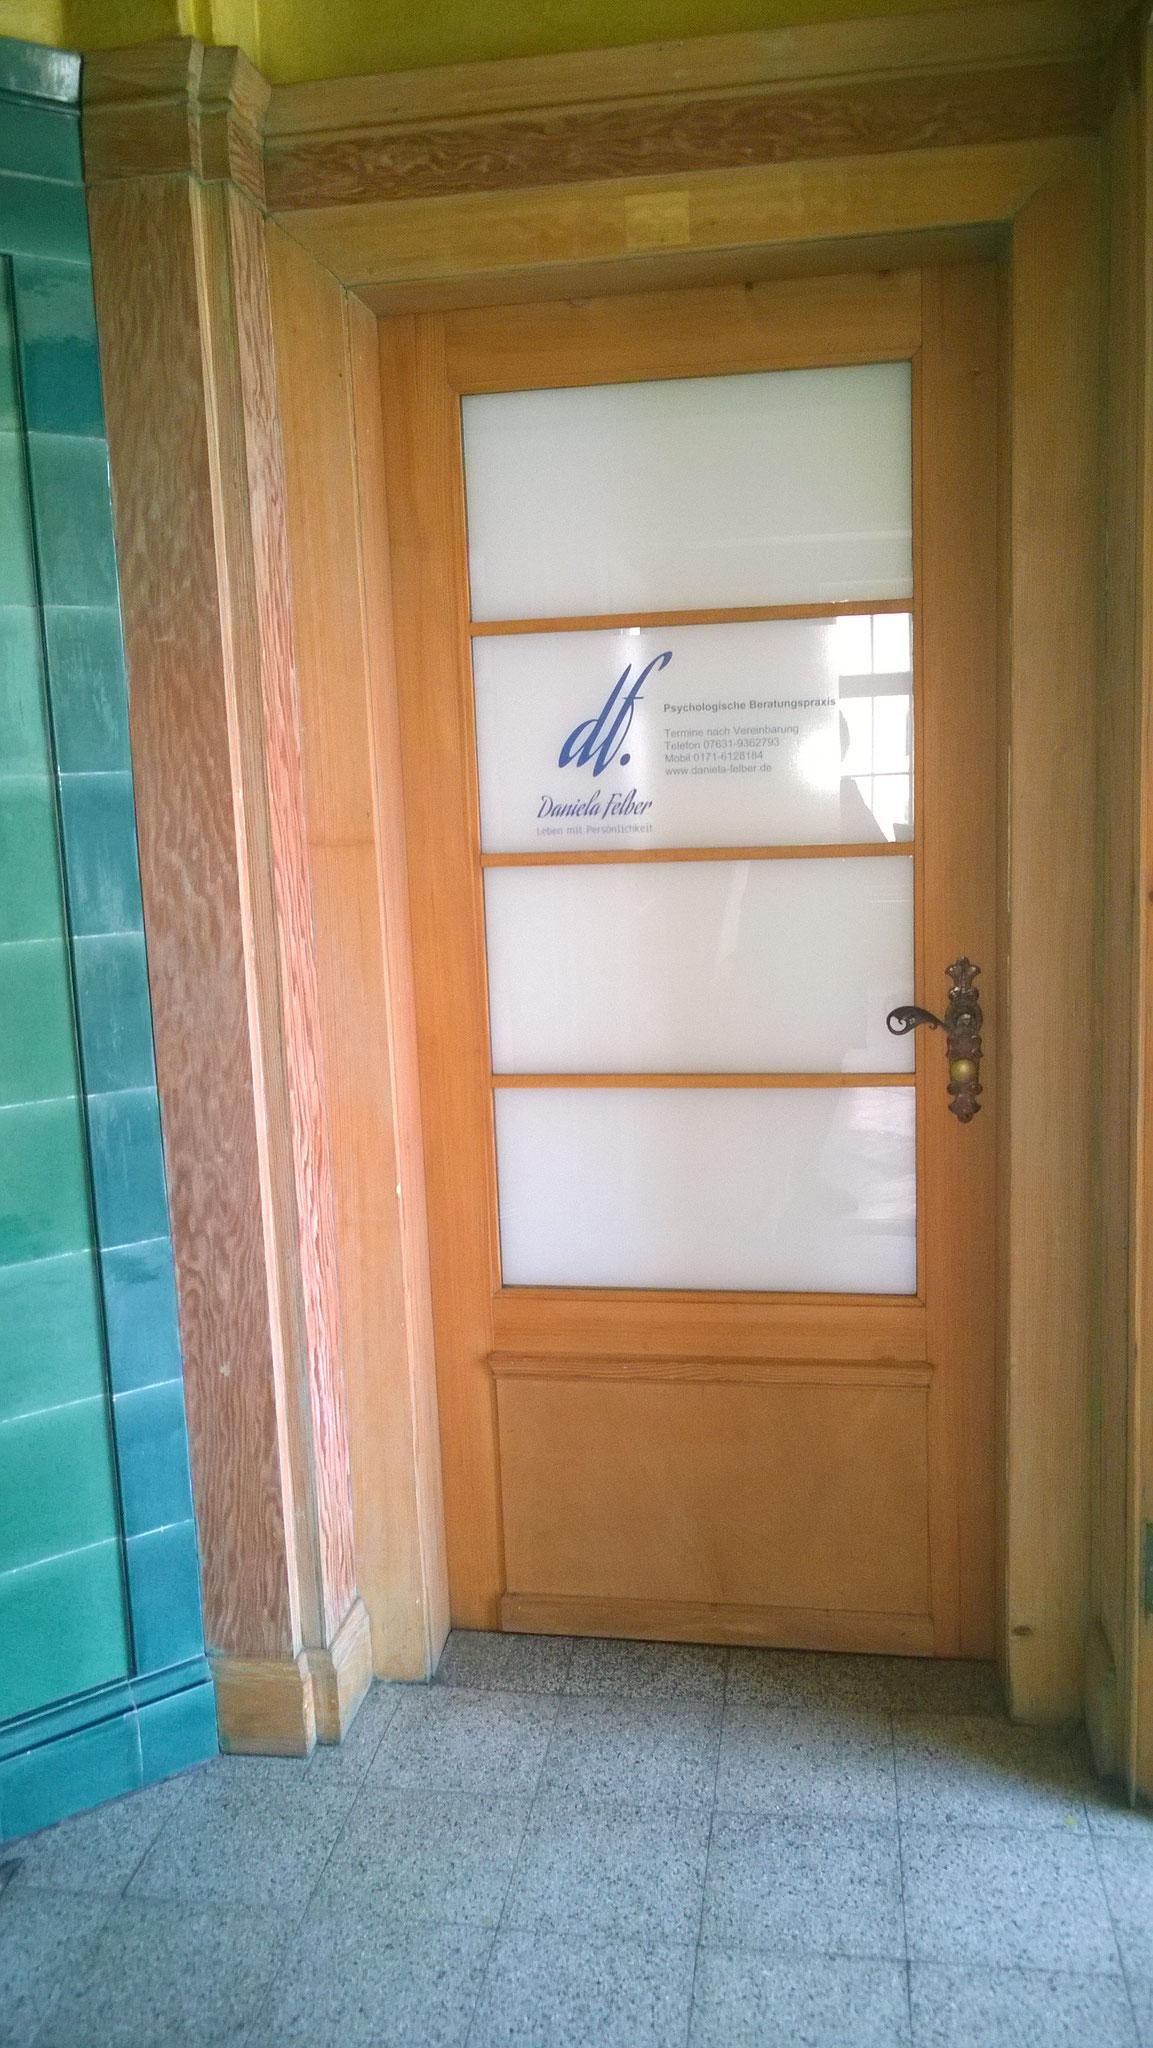 Eingang Beratungsraum